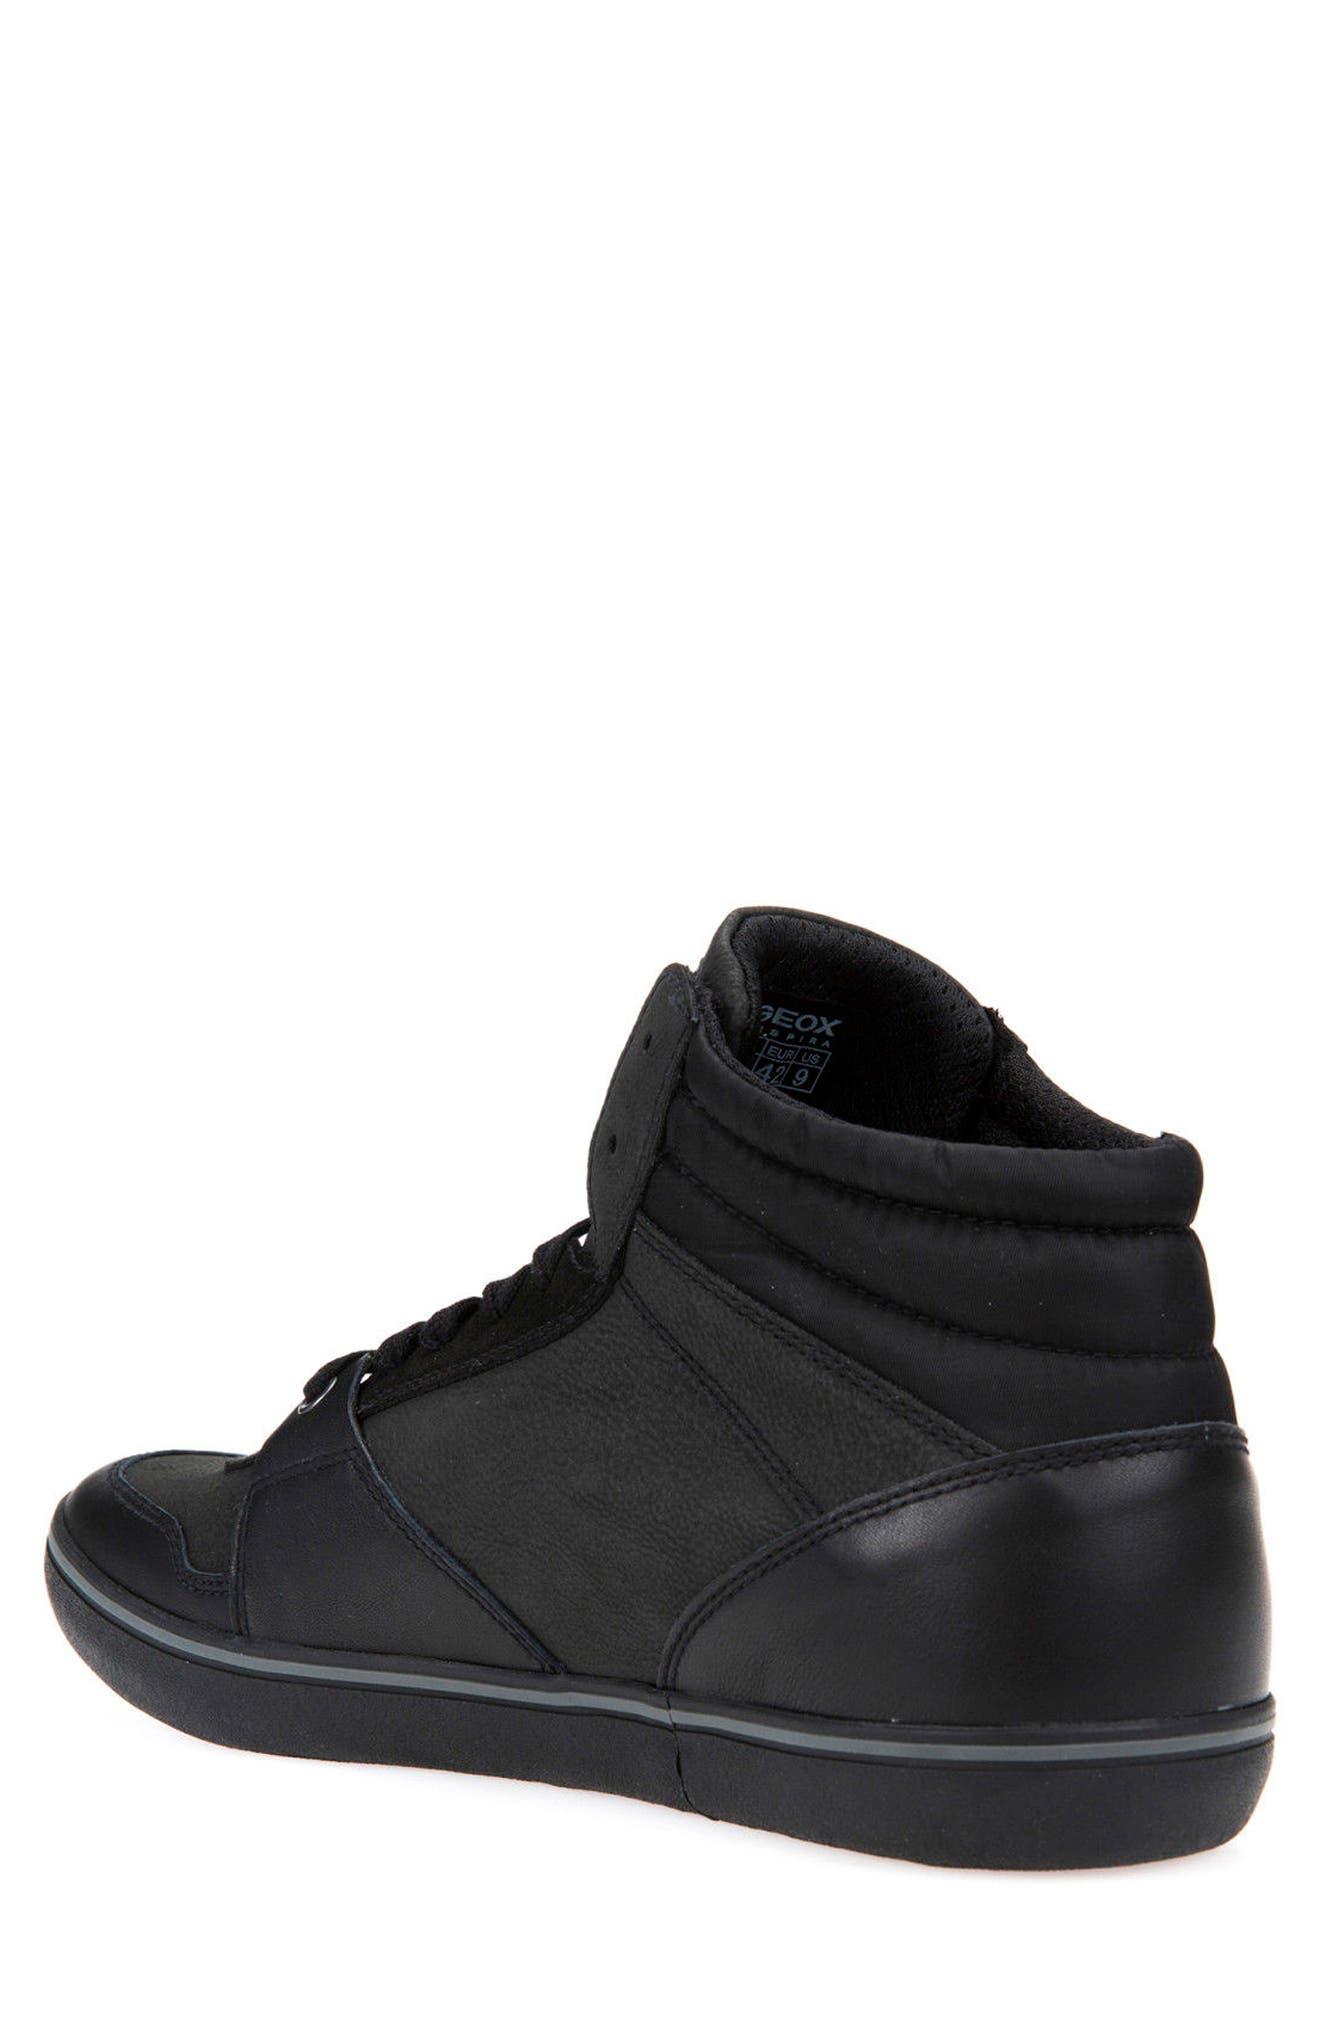 Box 31 High Top Sneaker,                             Alternate thumbnail 2, color,                             Black